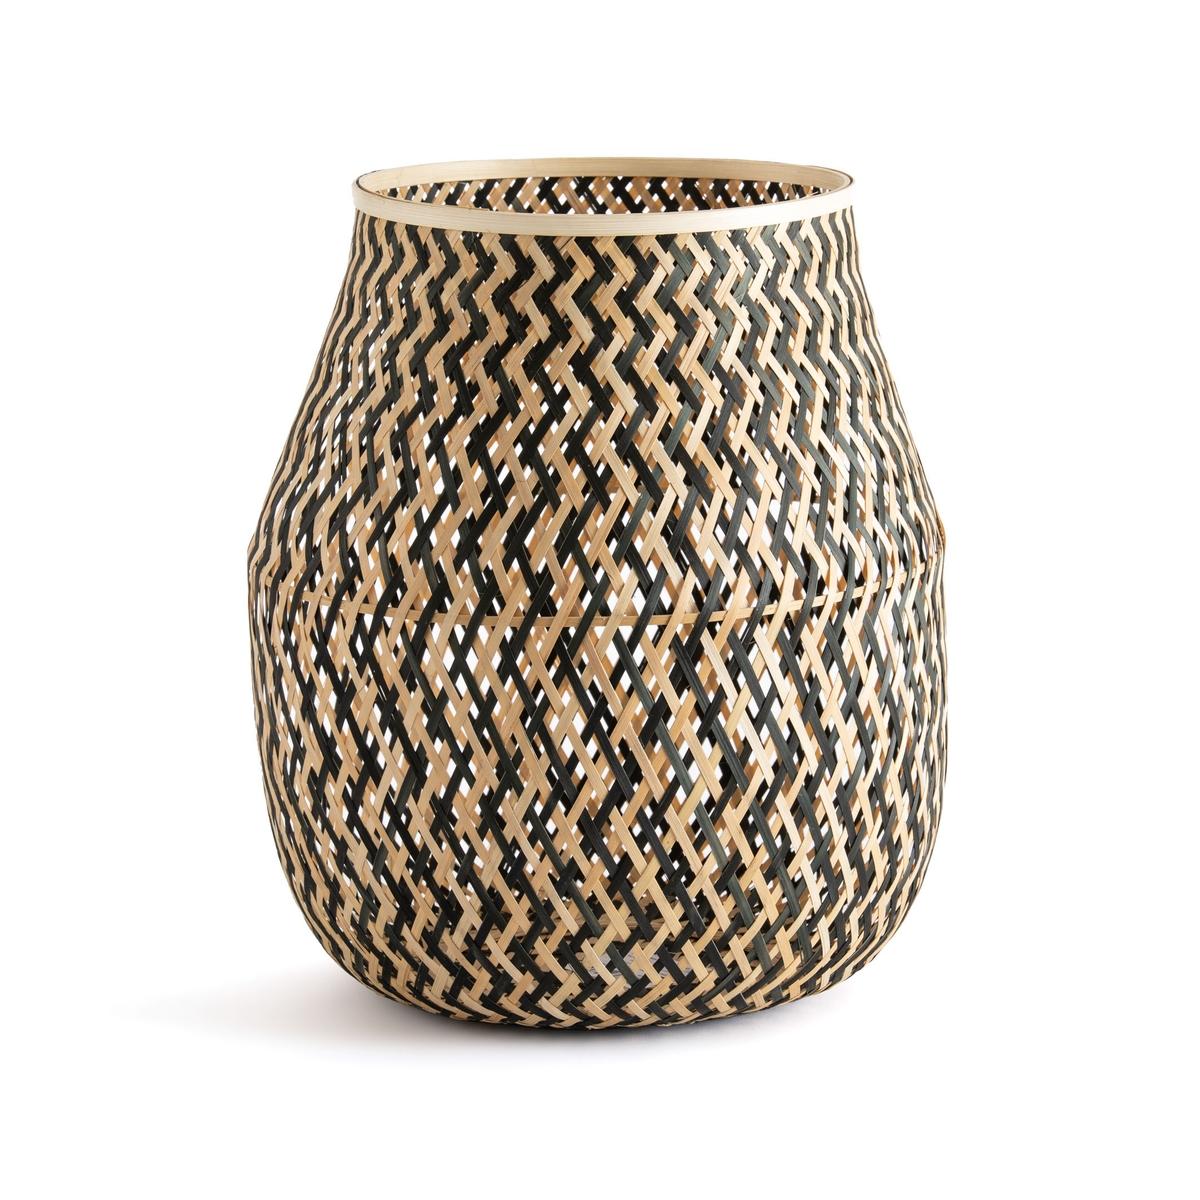 Корзина La Redoute Из плетеного бамбука Azzu единый размер бежевый